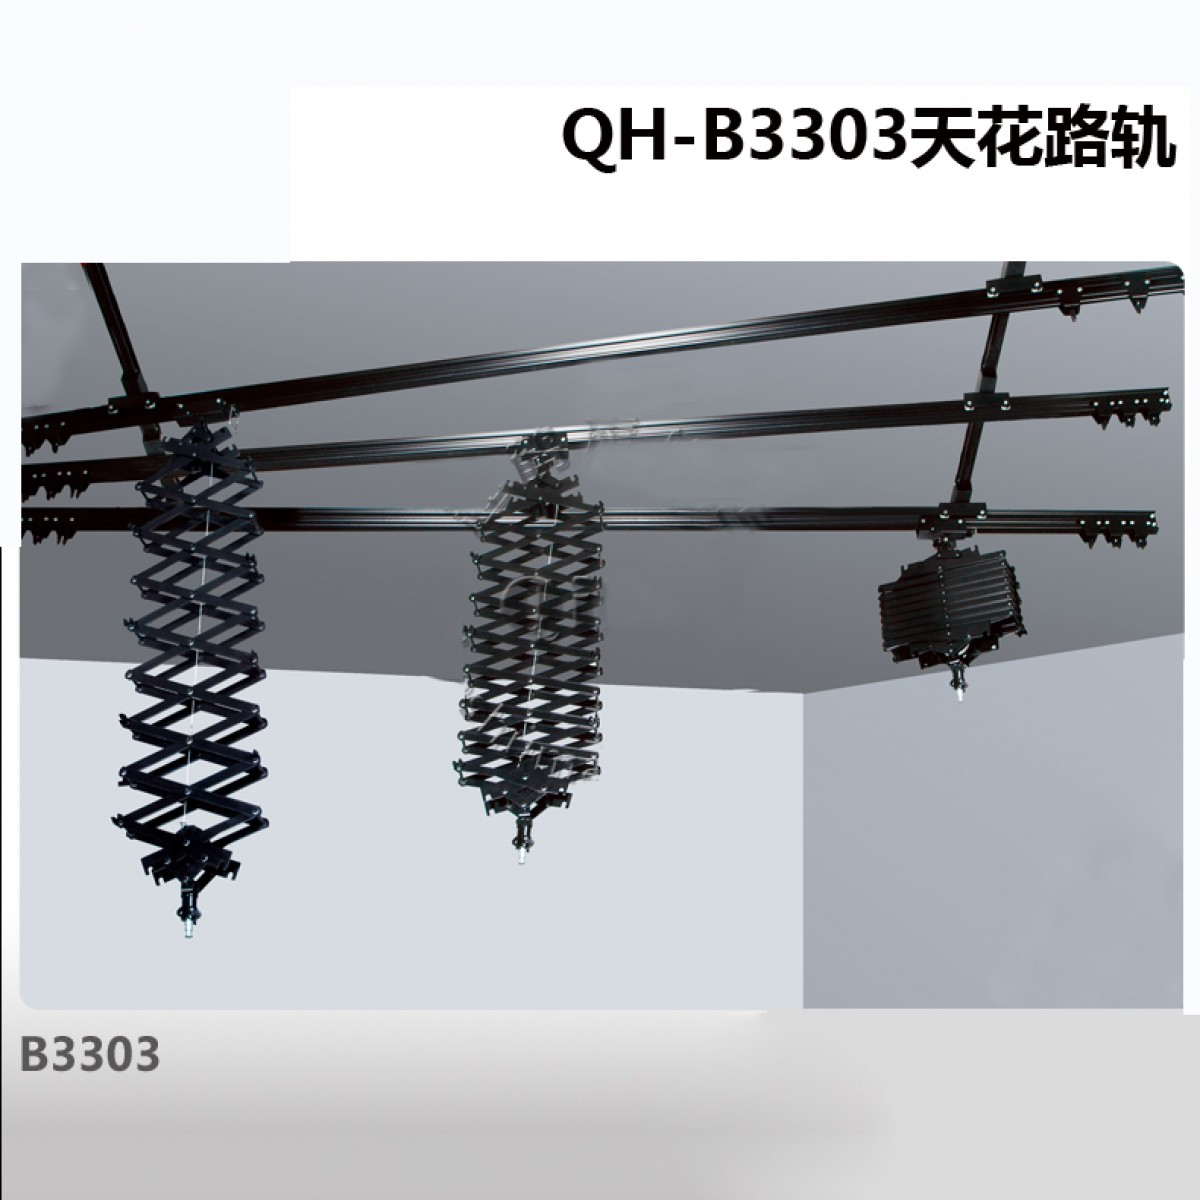 Qihe起鹤牌QH-B3303天花路轨 伸缩仪 导轨